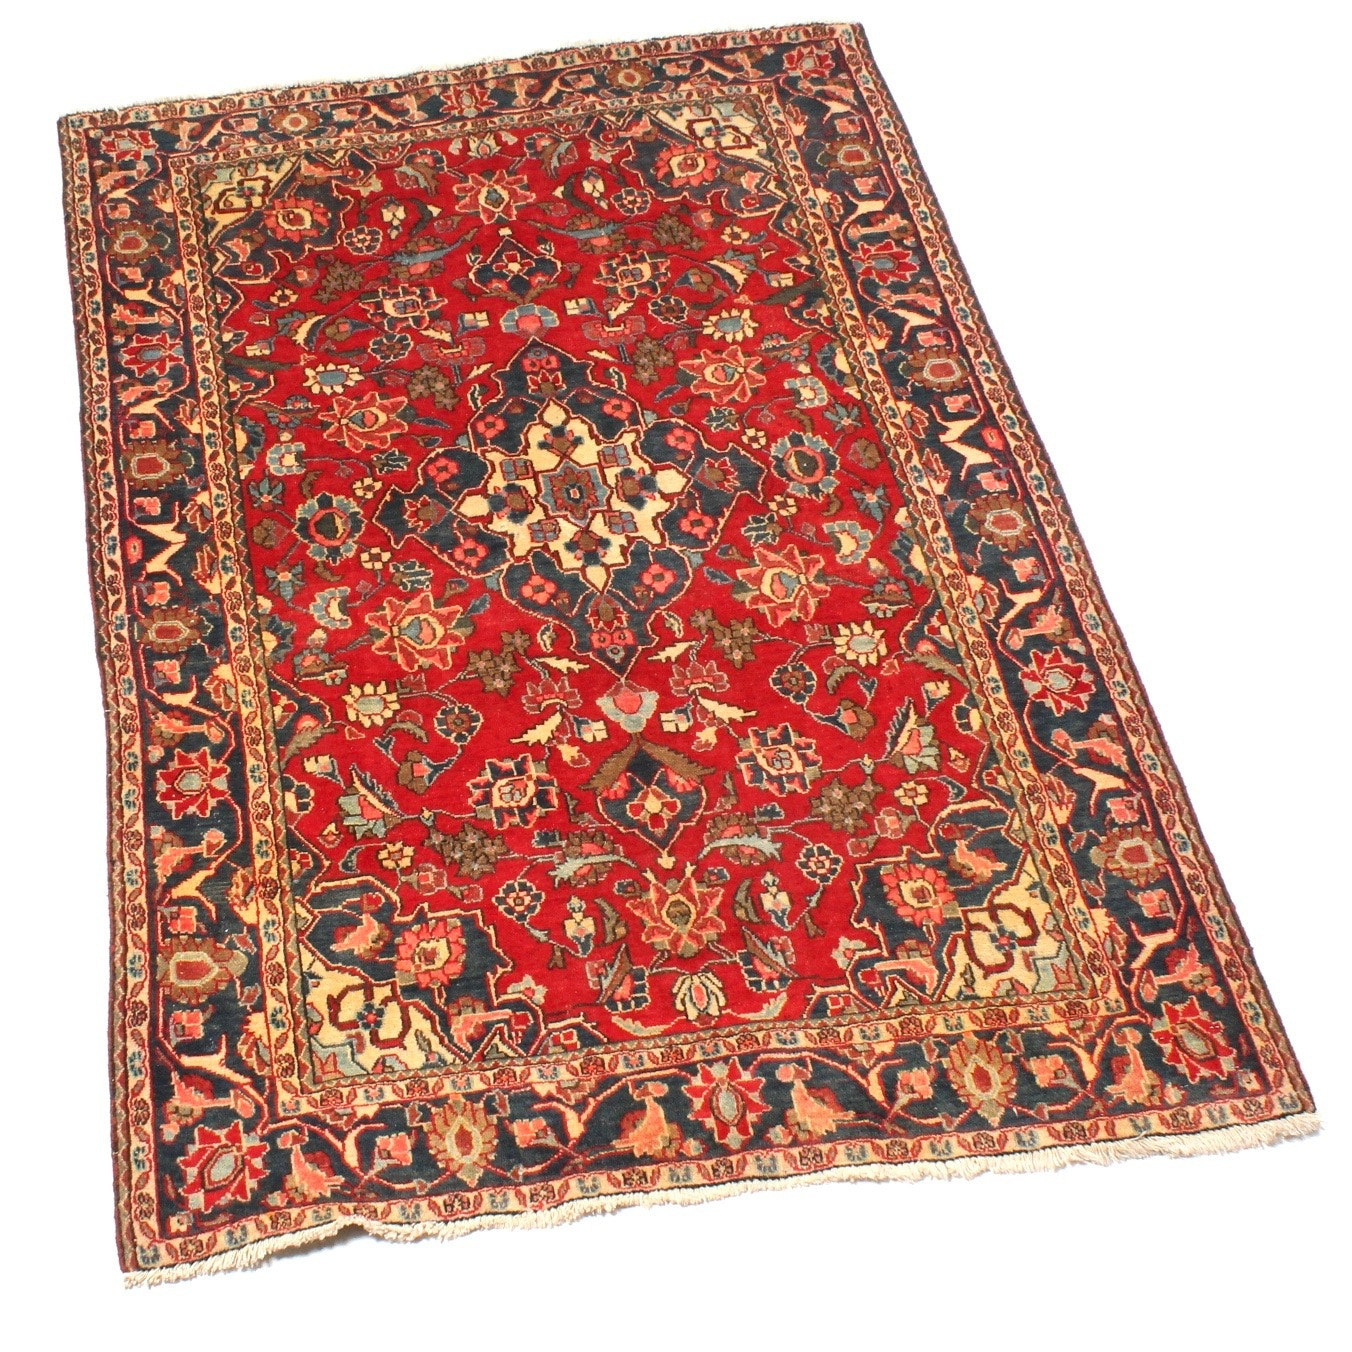 Vintage Hand-Knotted Persian Kashan Rug